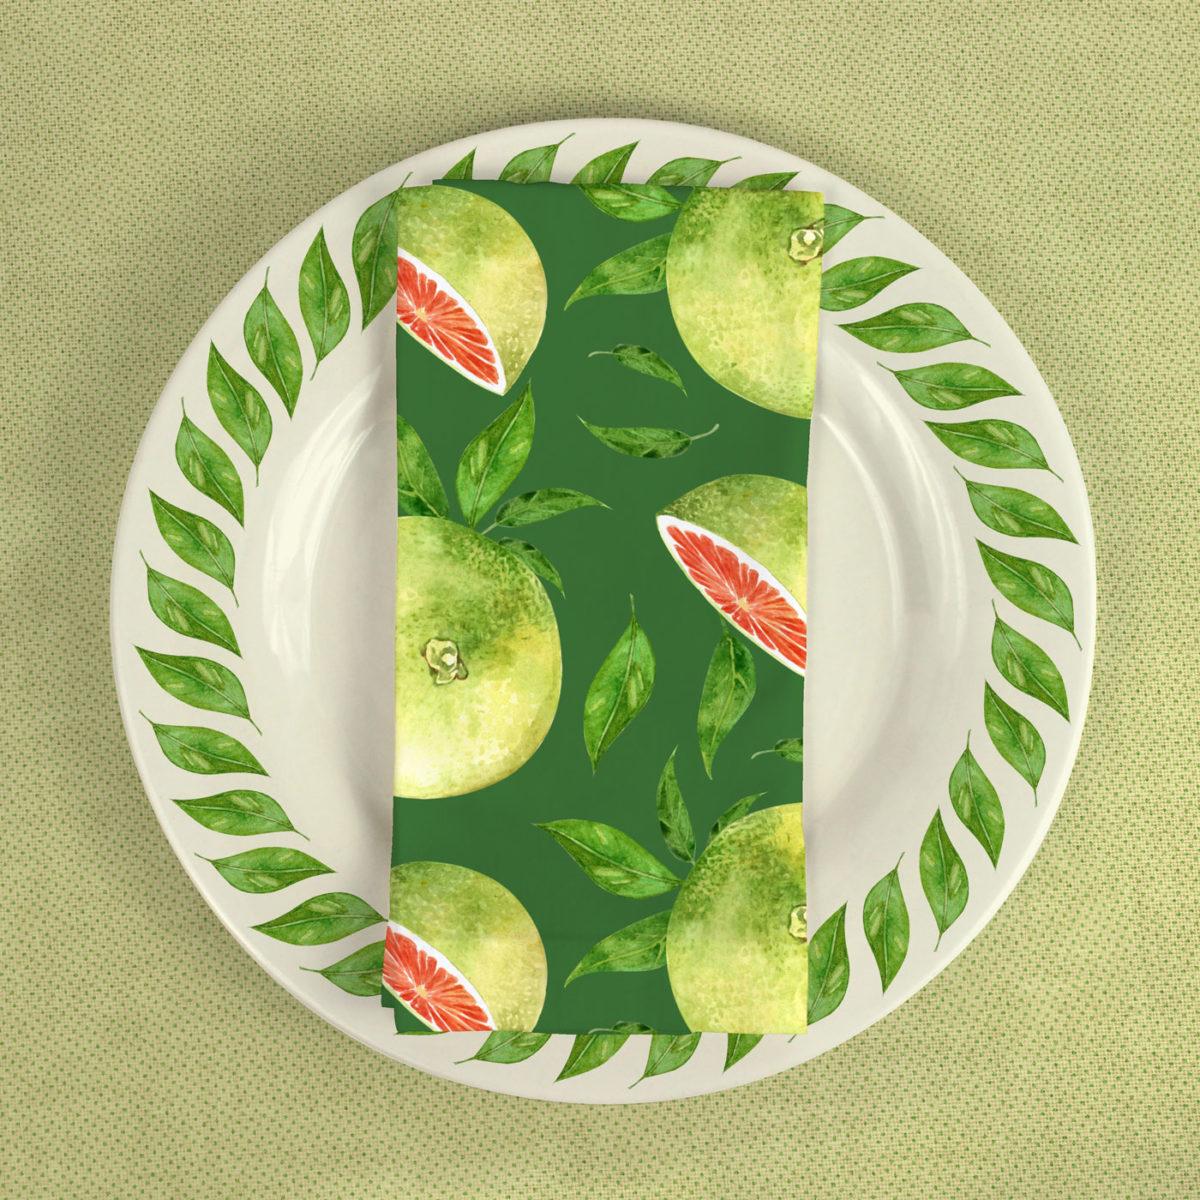 Grapefruit Pattern Collection Cynthia Oswald